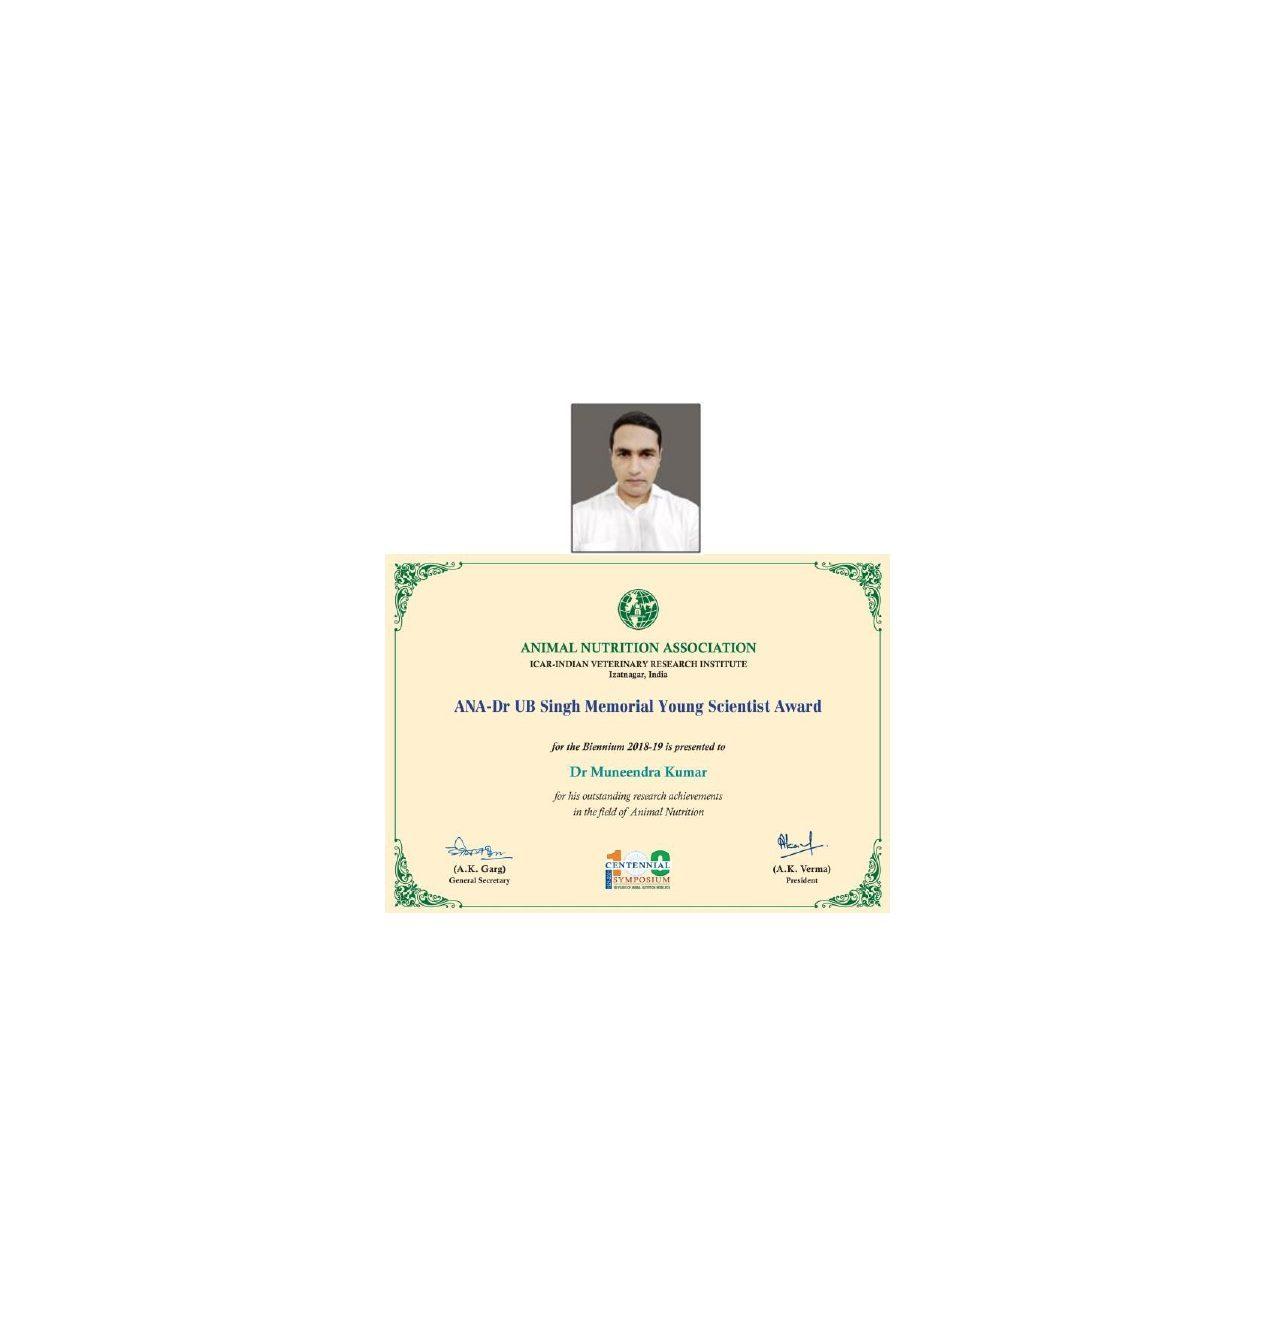 ANA -Dr UB Singh Memorial Young Scientist Award Dr. Muneendra Kumar